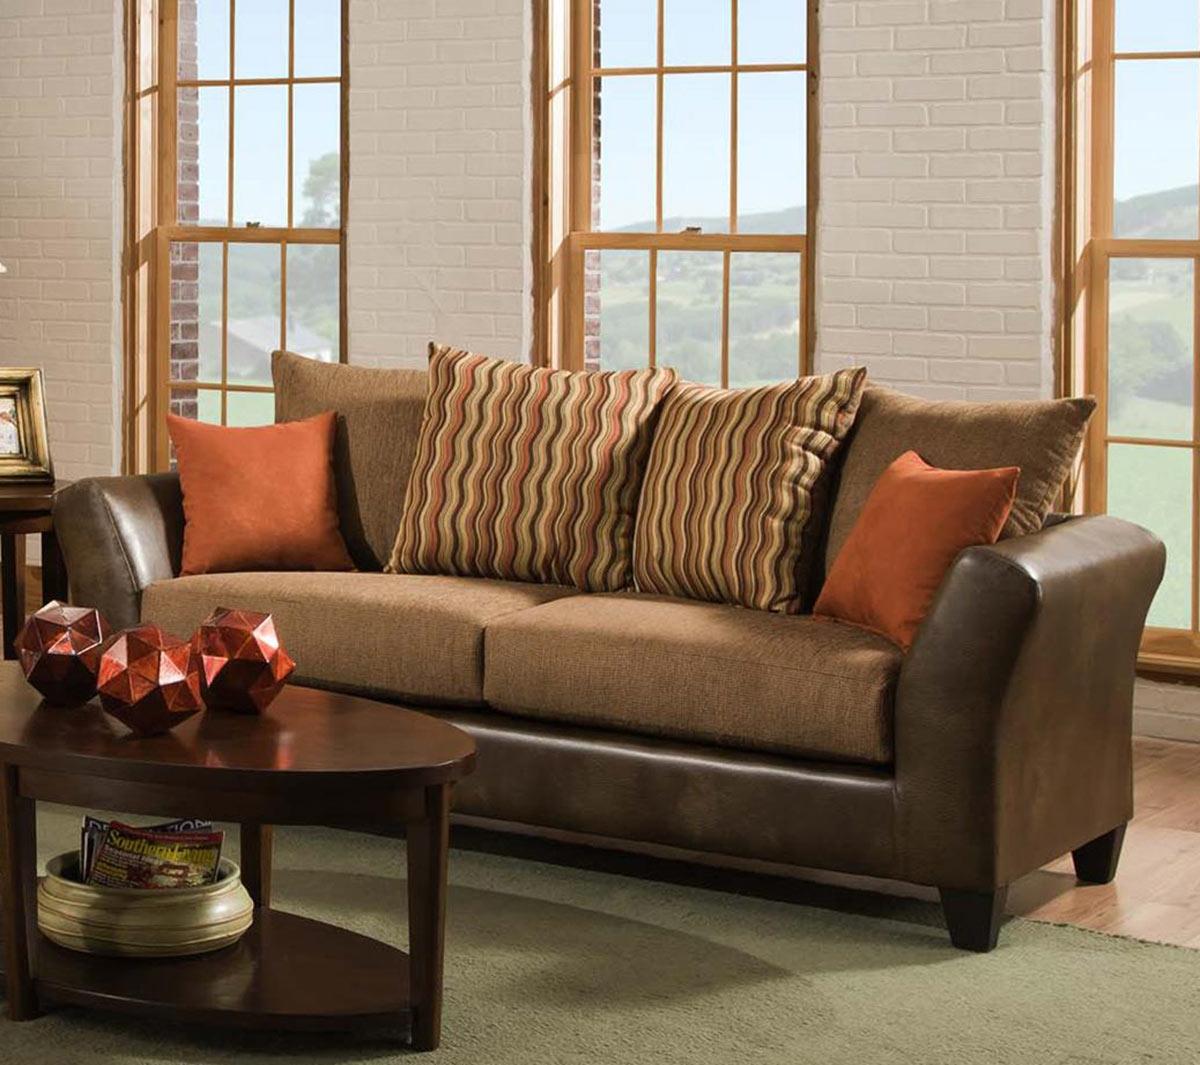 Chelsea Home Patch Sofa Set - Saddle